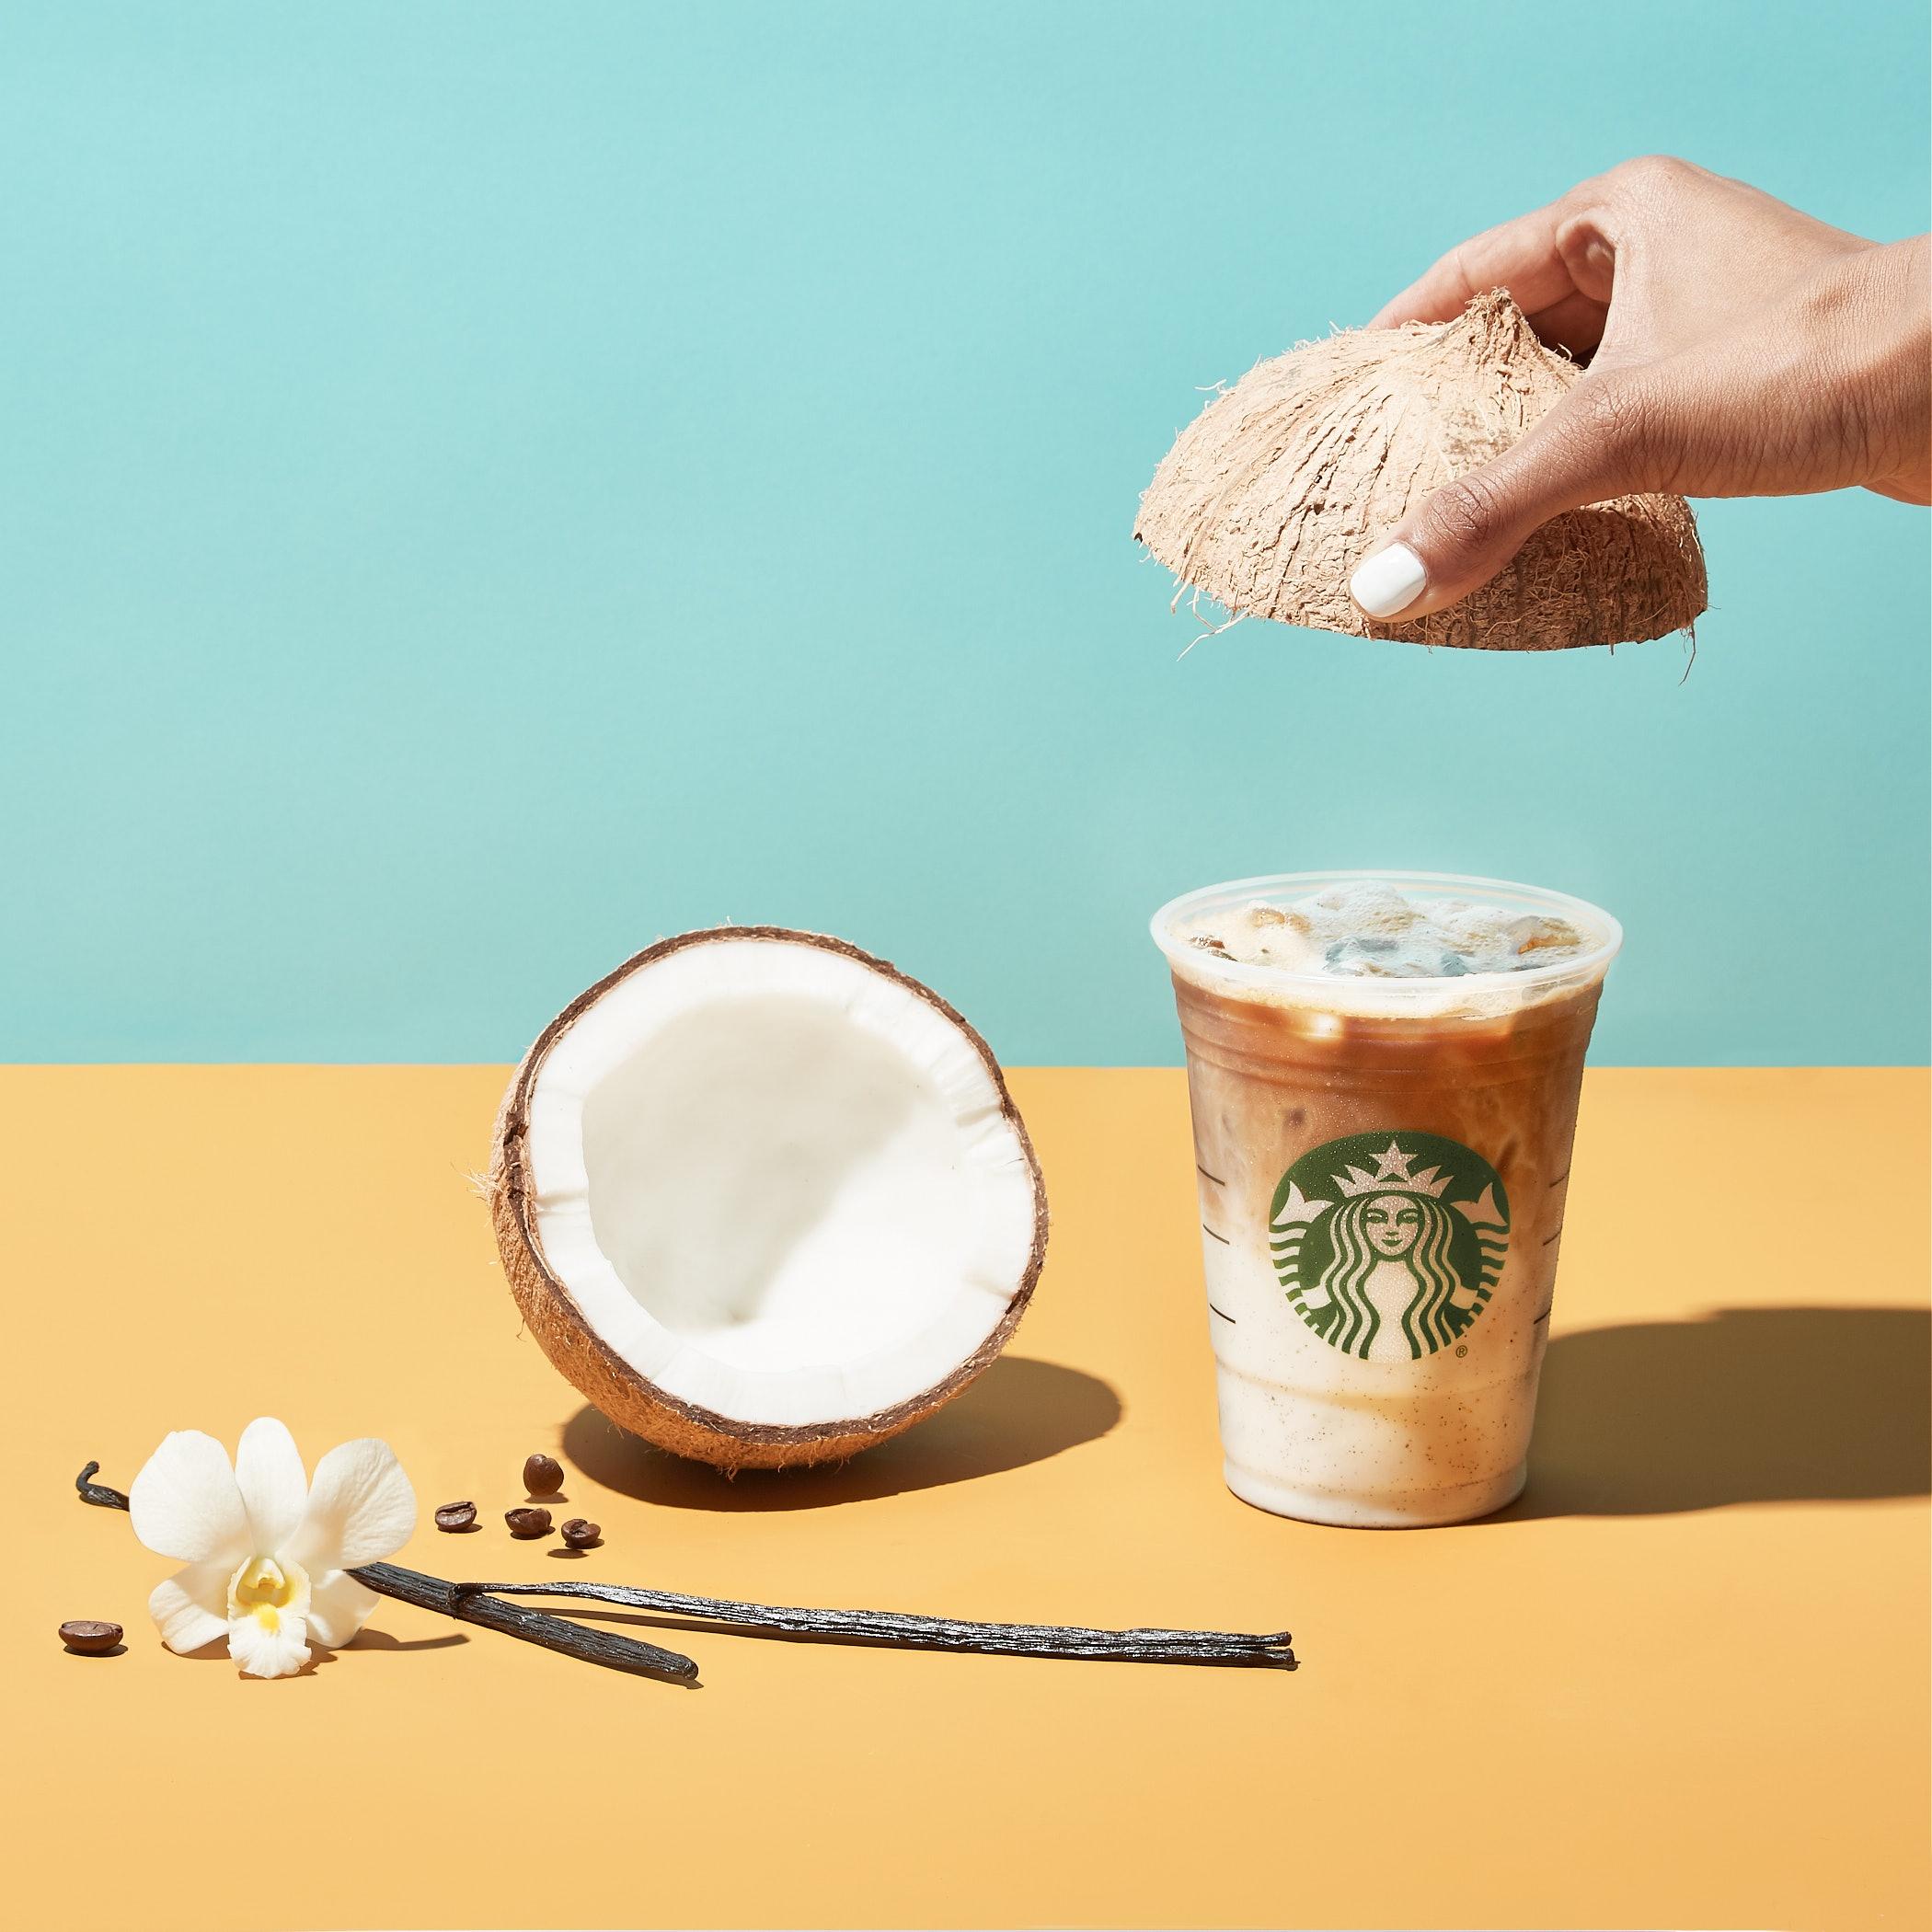 How to make a iced vanilla latte like starbucks